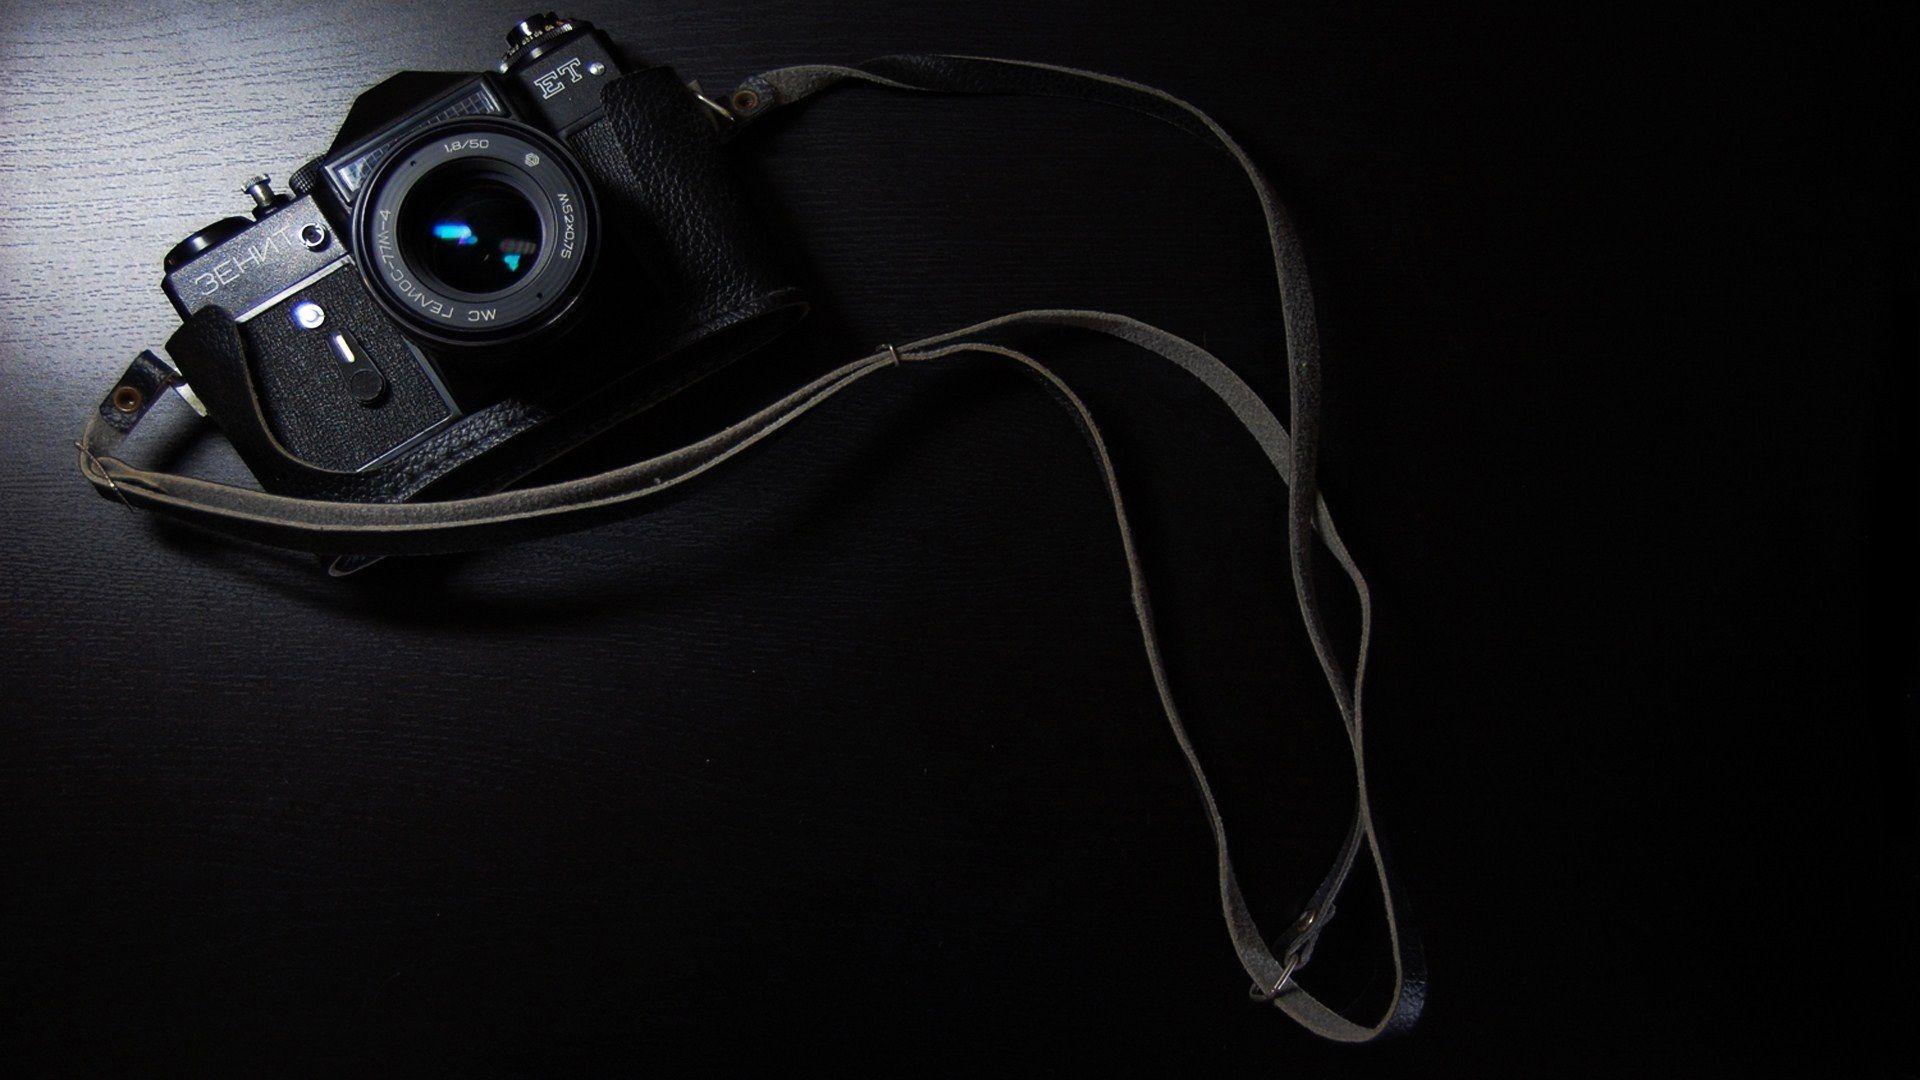 Zenit Camera, ET, camera, black, hi-tech, technology, wallpaper